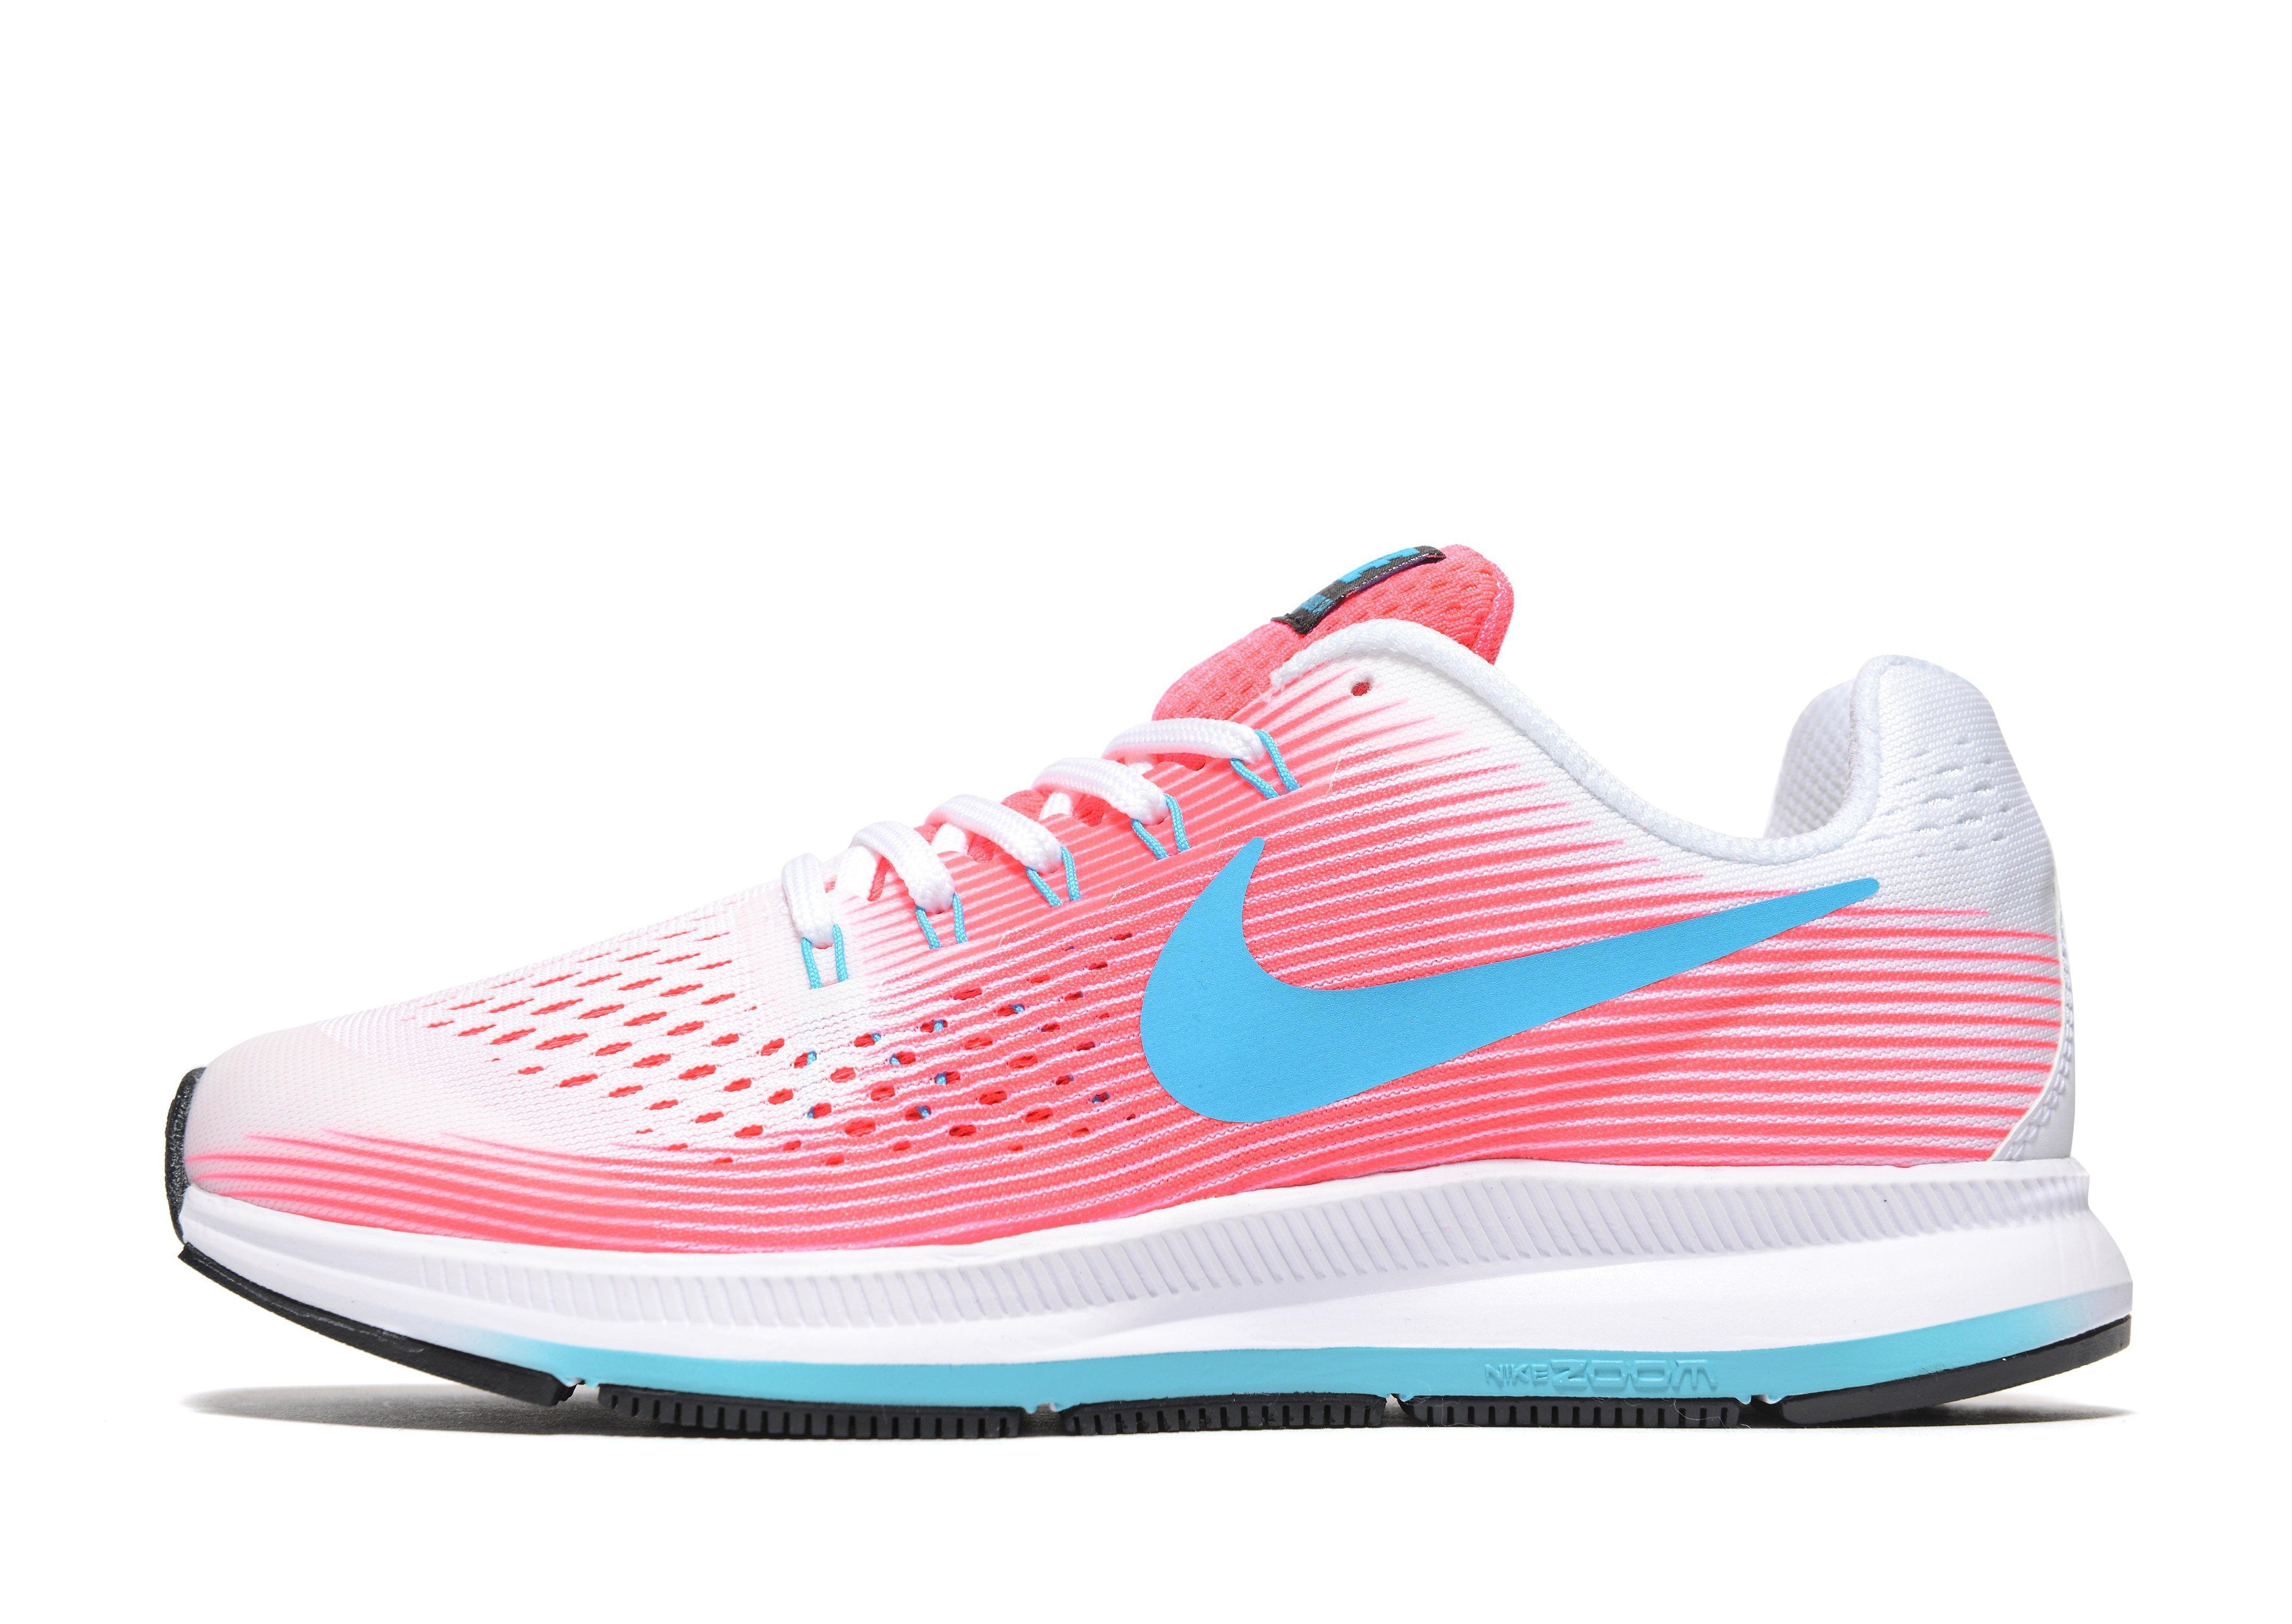 Lyst - Nike Zoom Pegasus 34 Junior in Pink a517c788707a